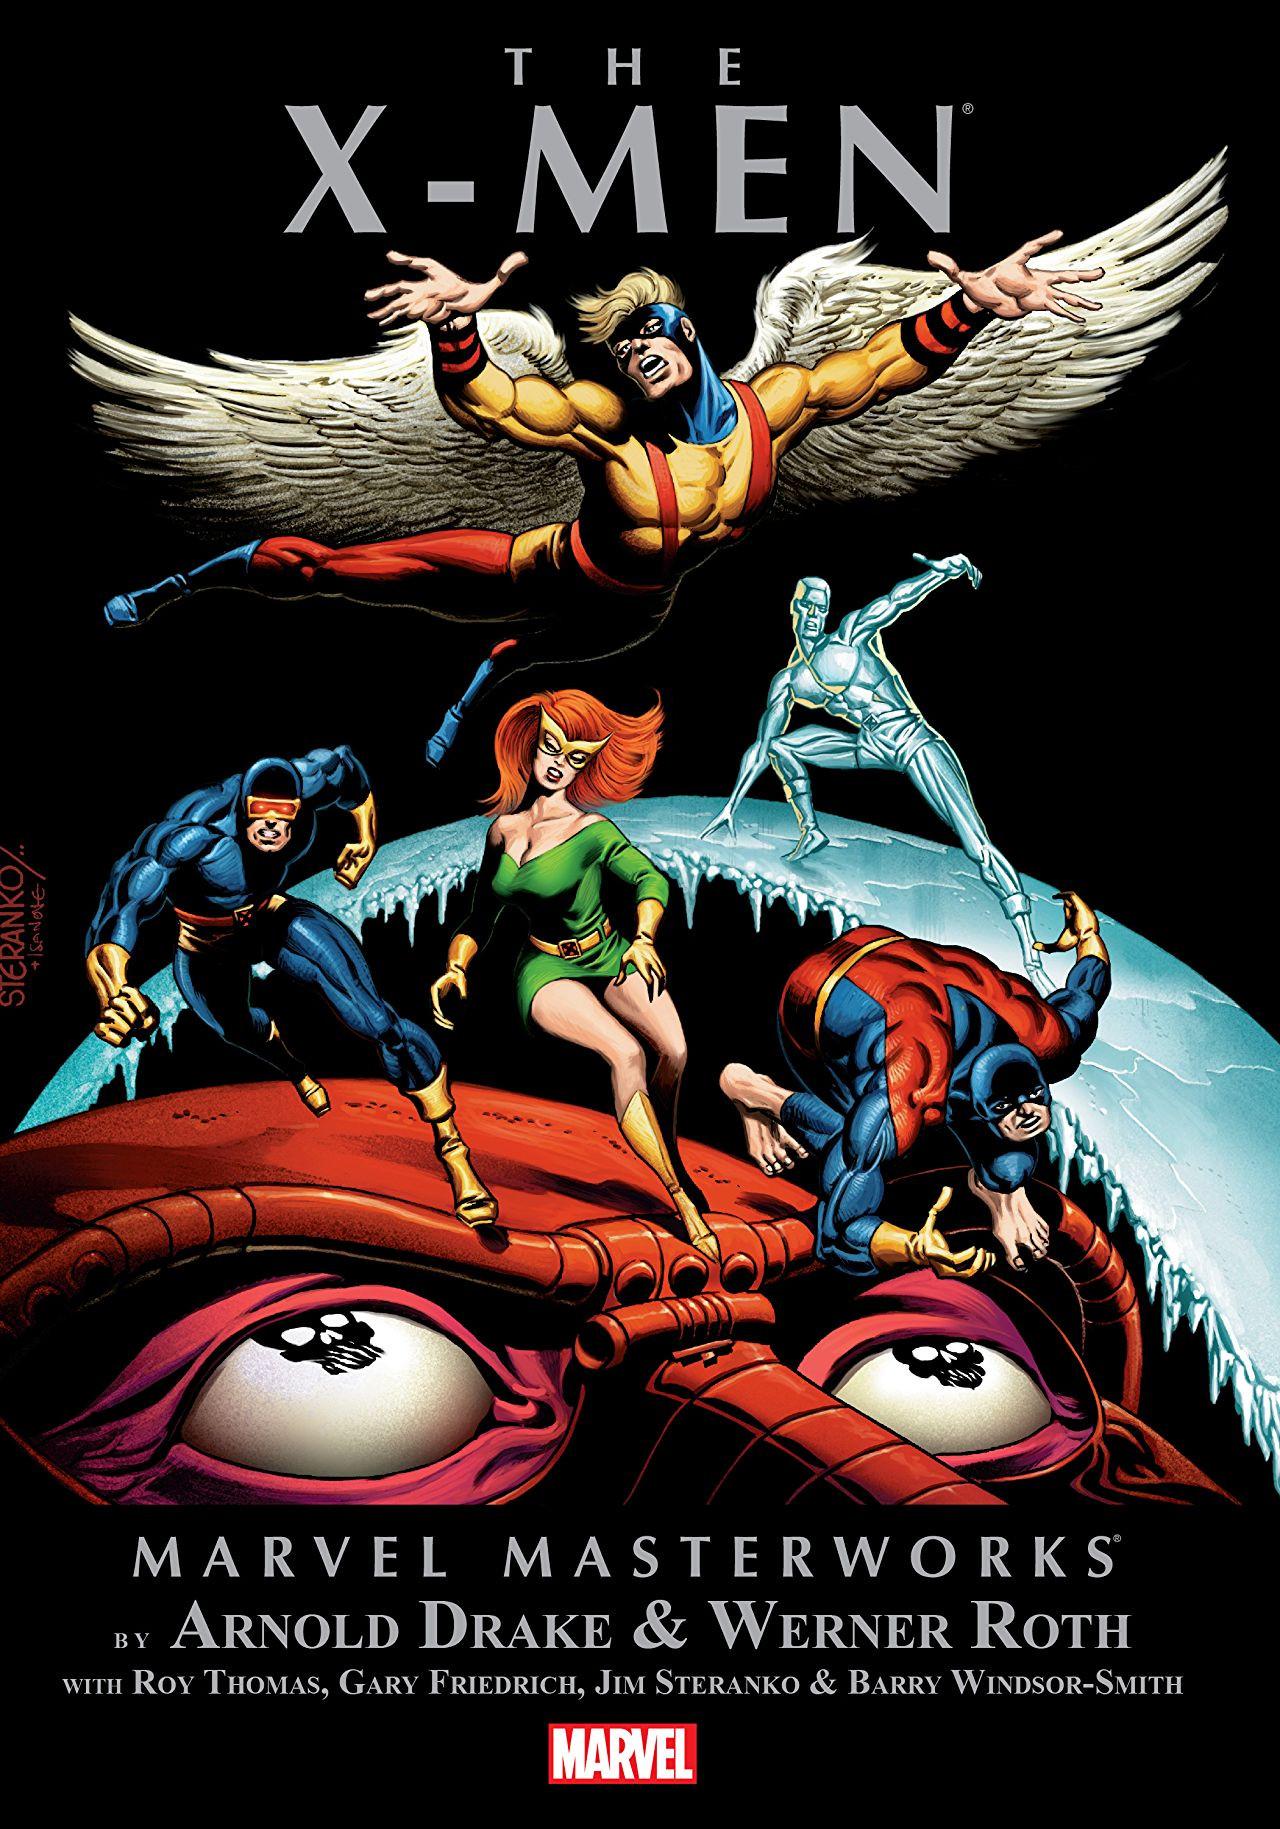 Marvel Masterworks: The X-Men Vol 1 5